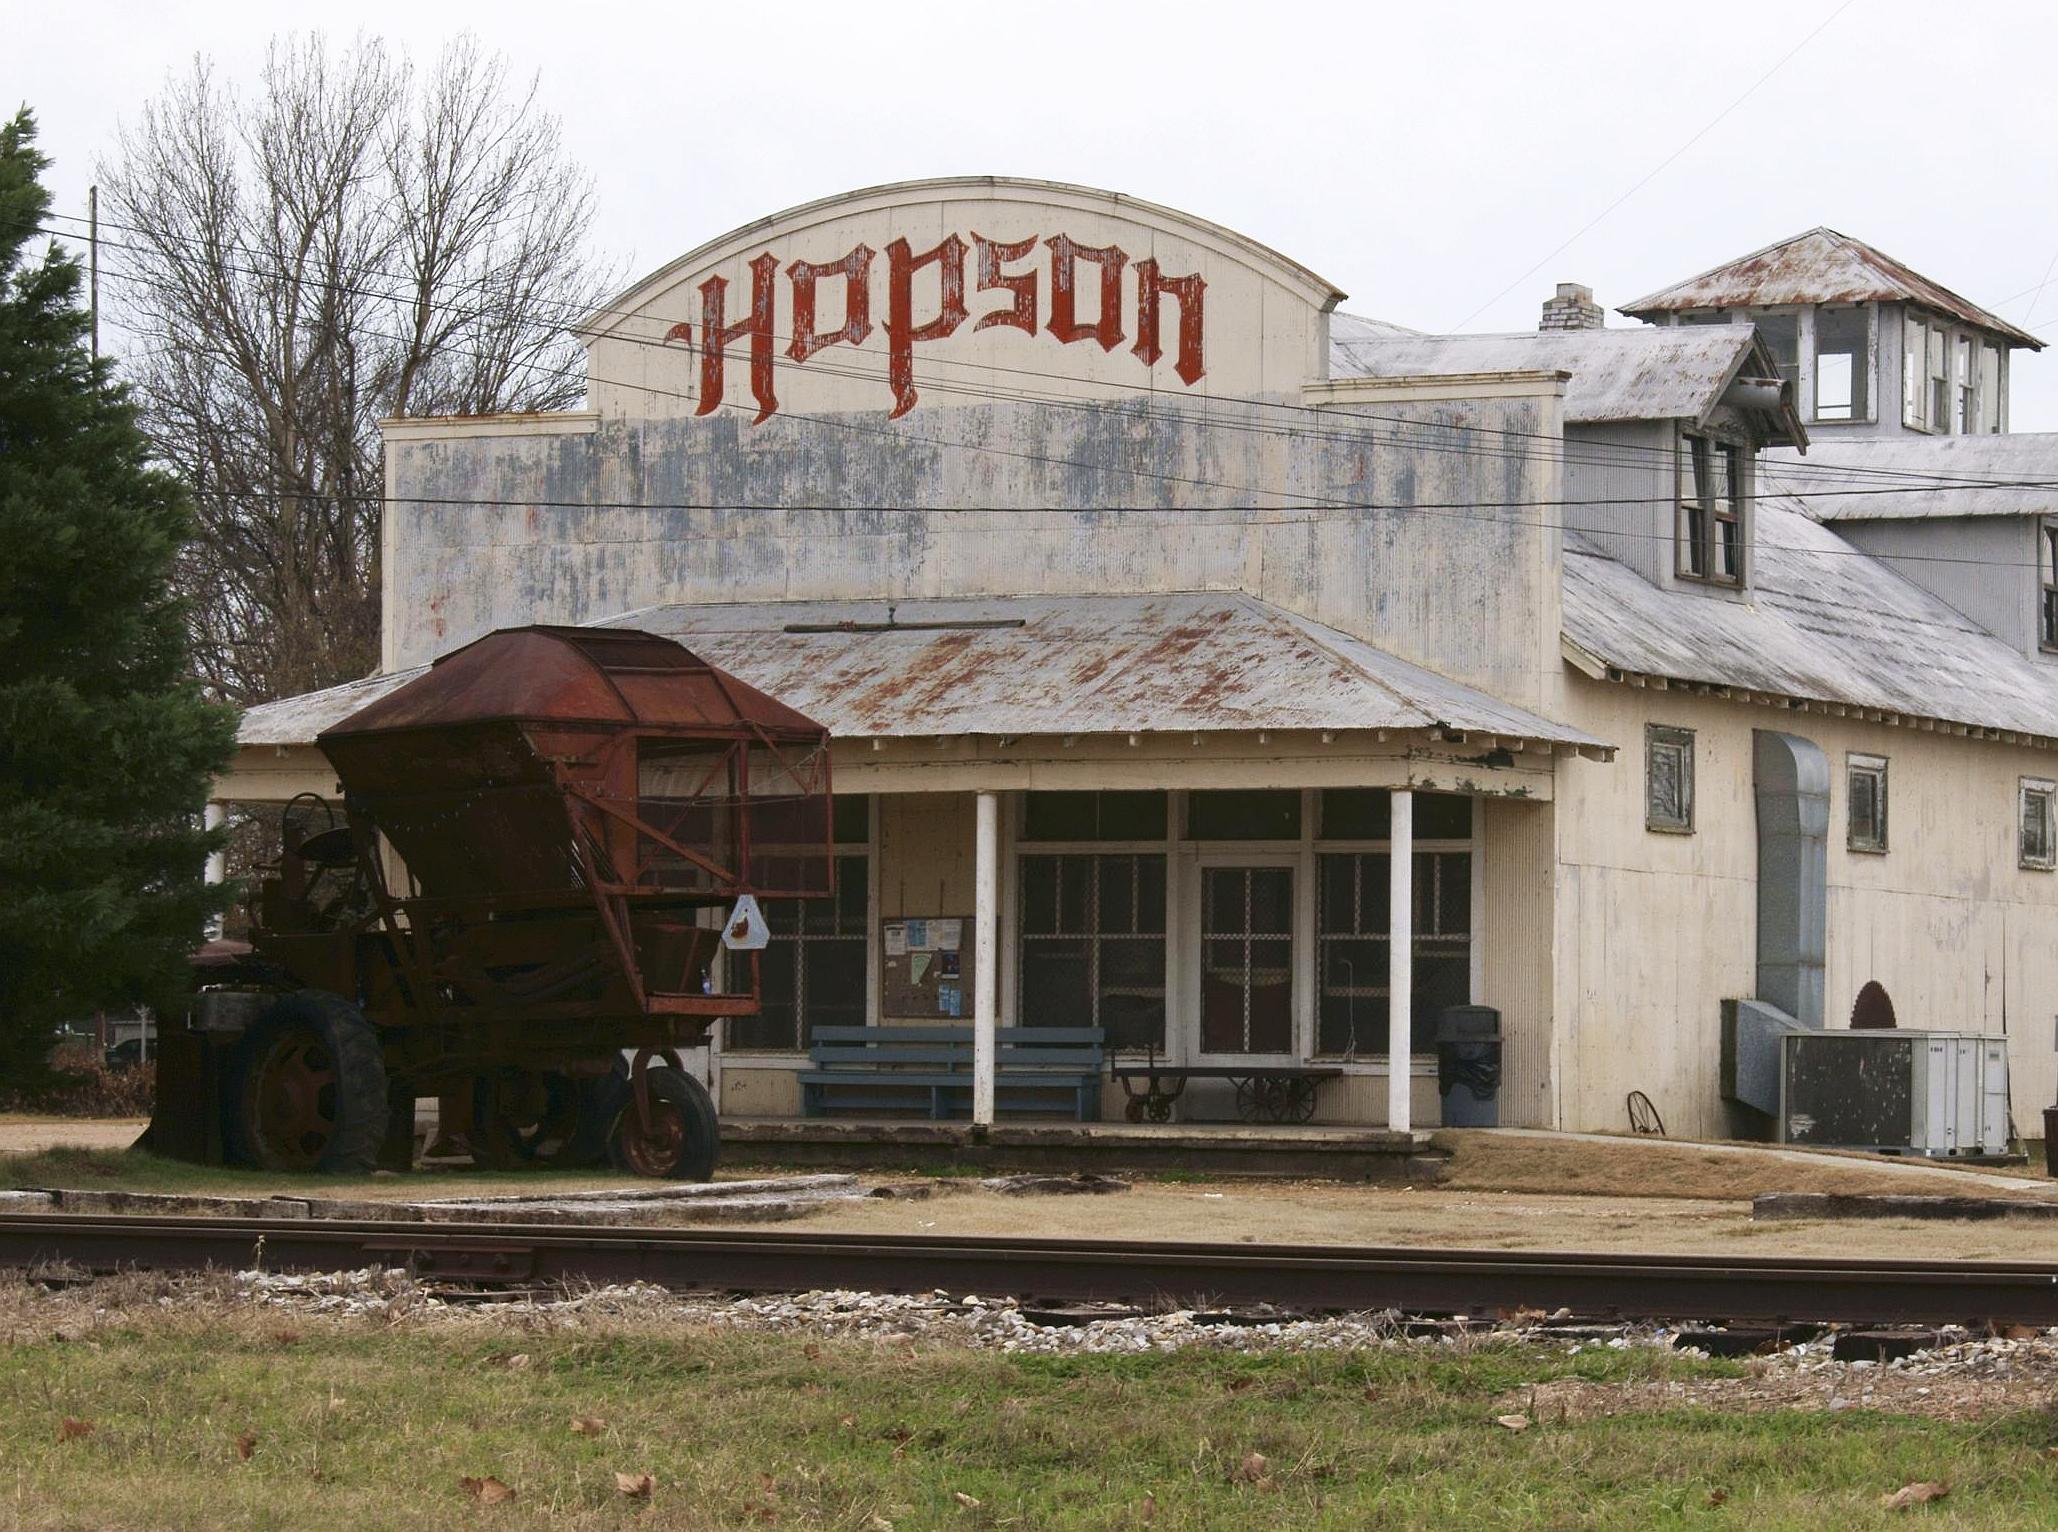 Mississippi coahoma county sherard - File Hopson Plantation Coahoma County Mississippi Jpg